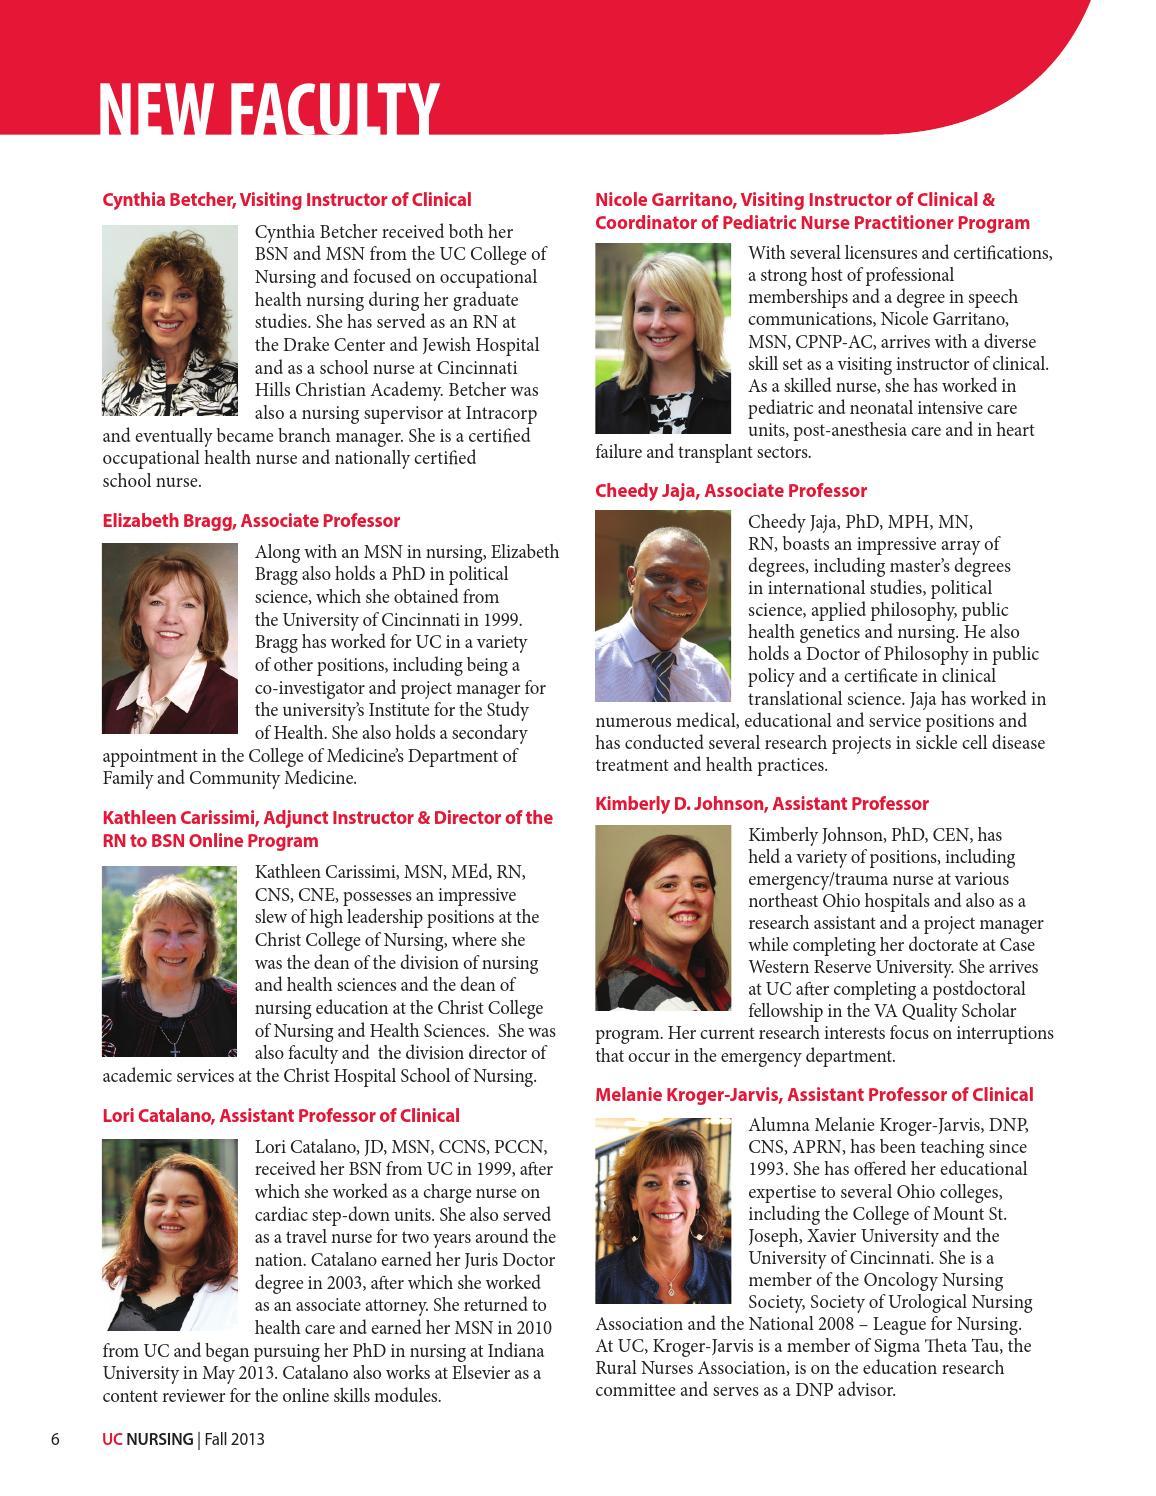 UC Nursing Magazine - Fall 2013 by UC College of Nursing - issuu